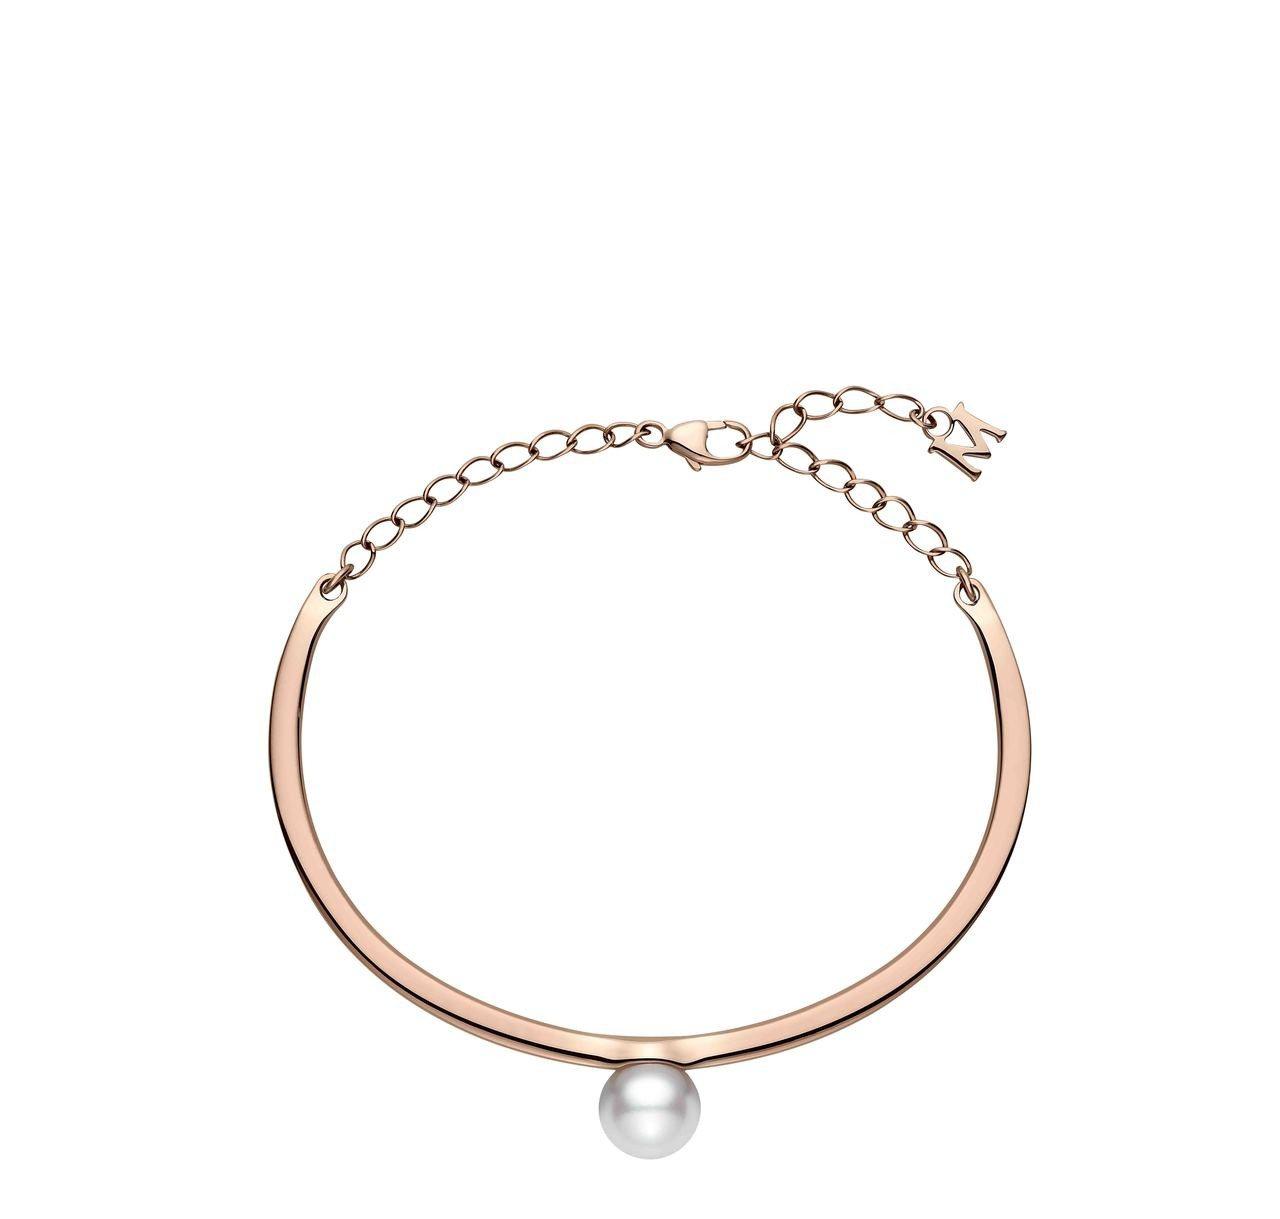 MIKIMOTO珍珠手環,18K粉紅金鑲嵌日本Akoya珍珠,79,800元。圖...